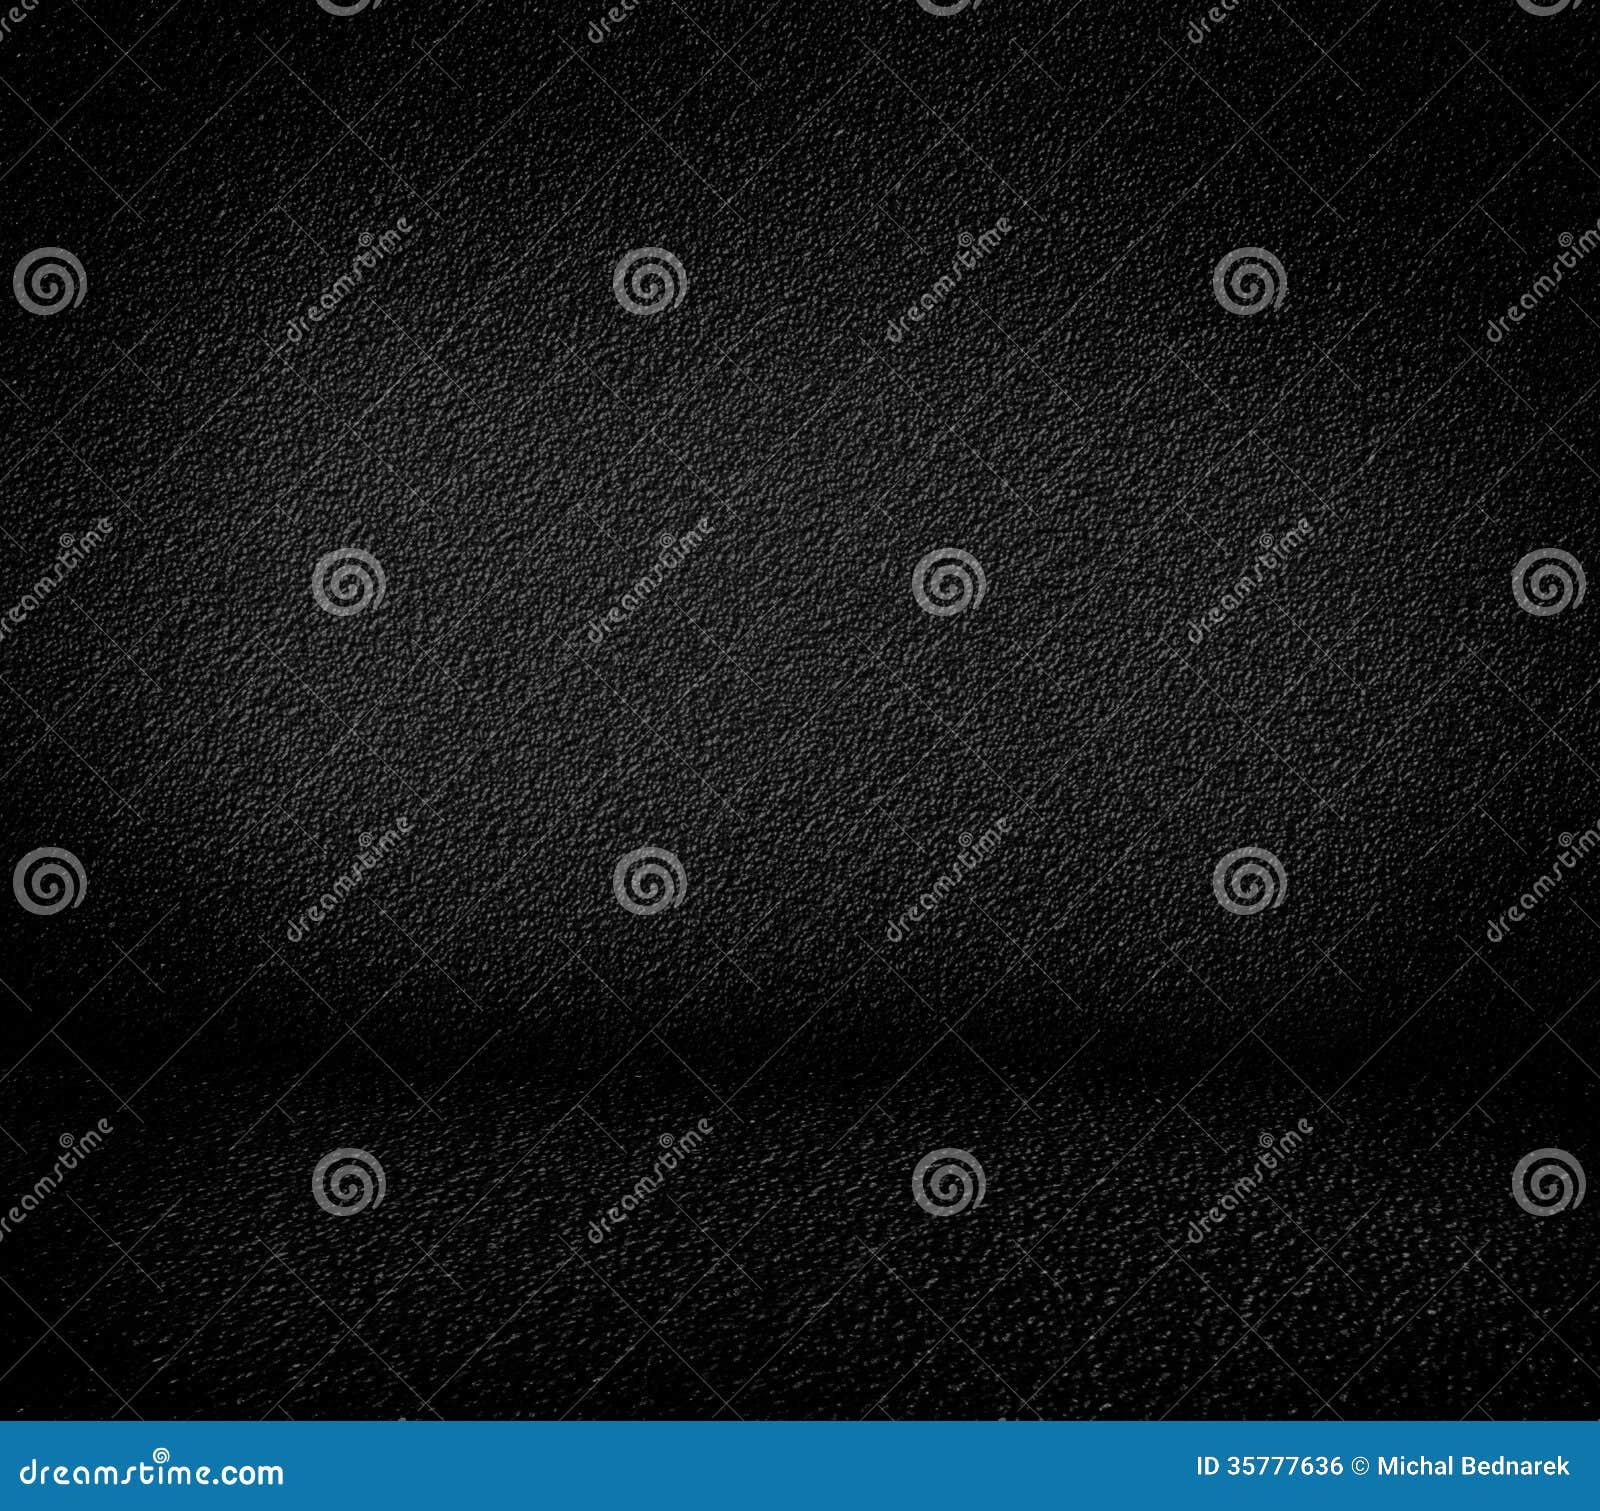 Black Minimalist Grainy Wall Background And Black Floor